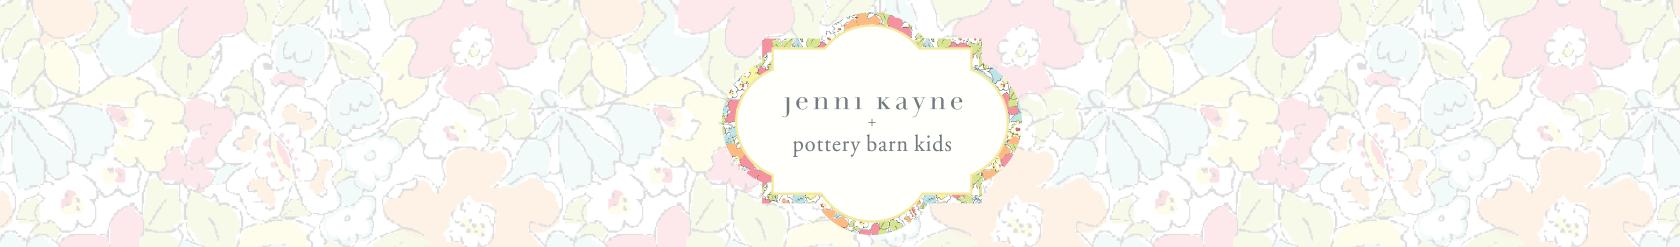 Jenni Kayne Collection at Pottery Barn Kids